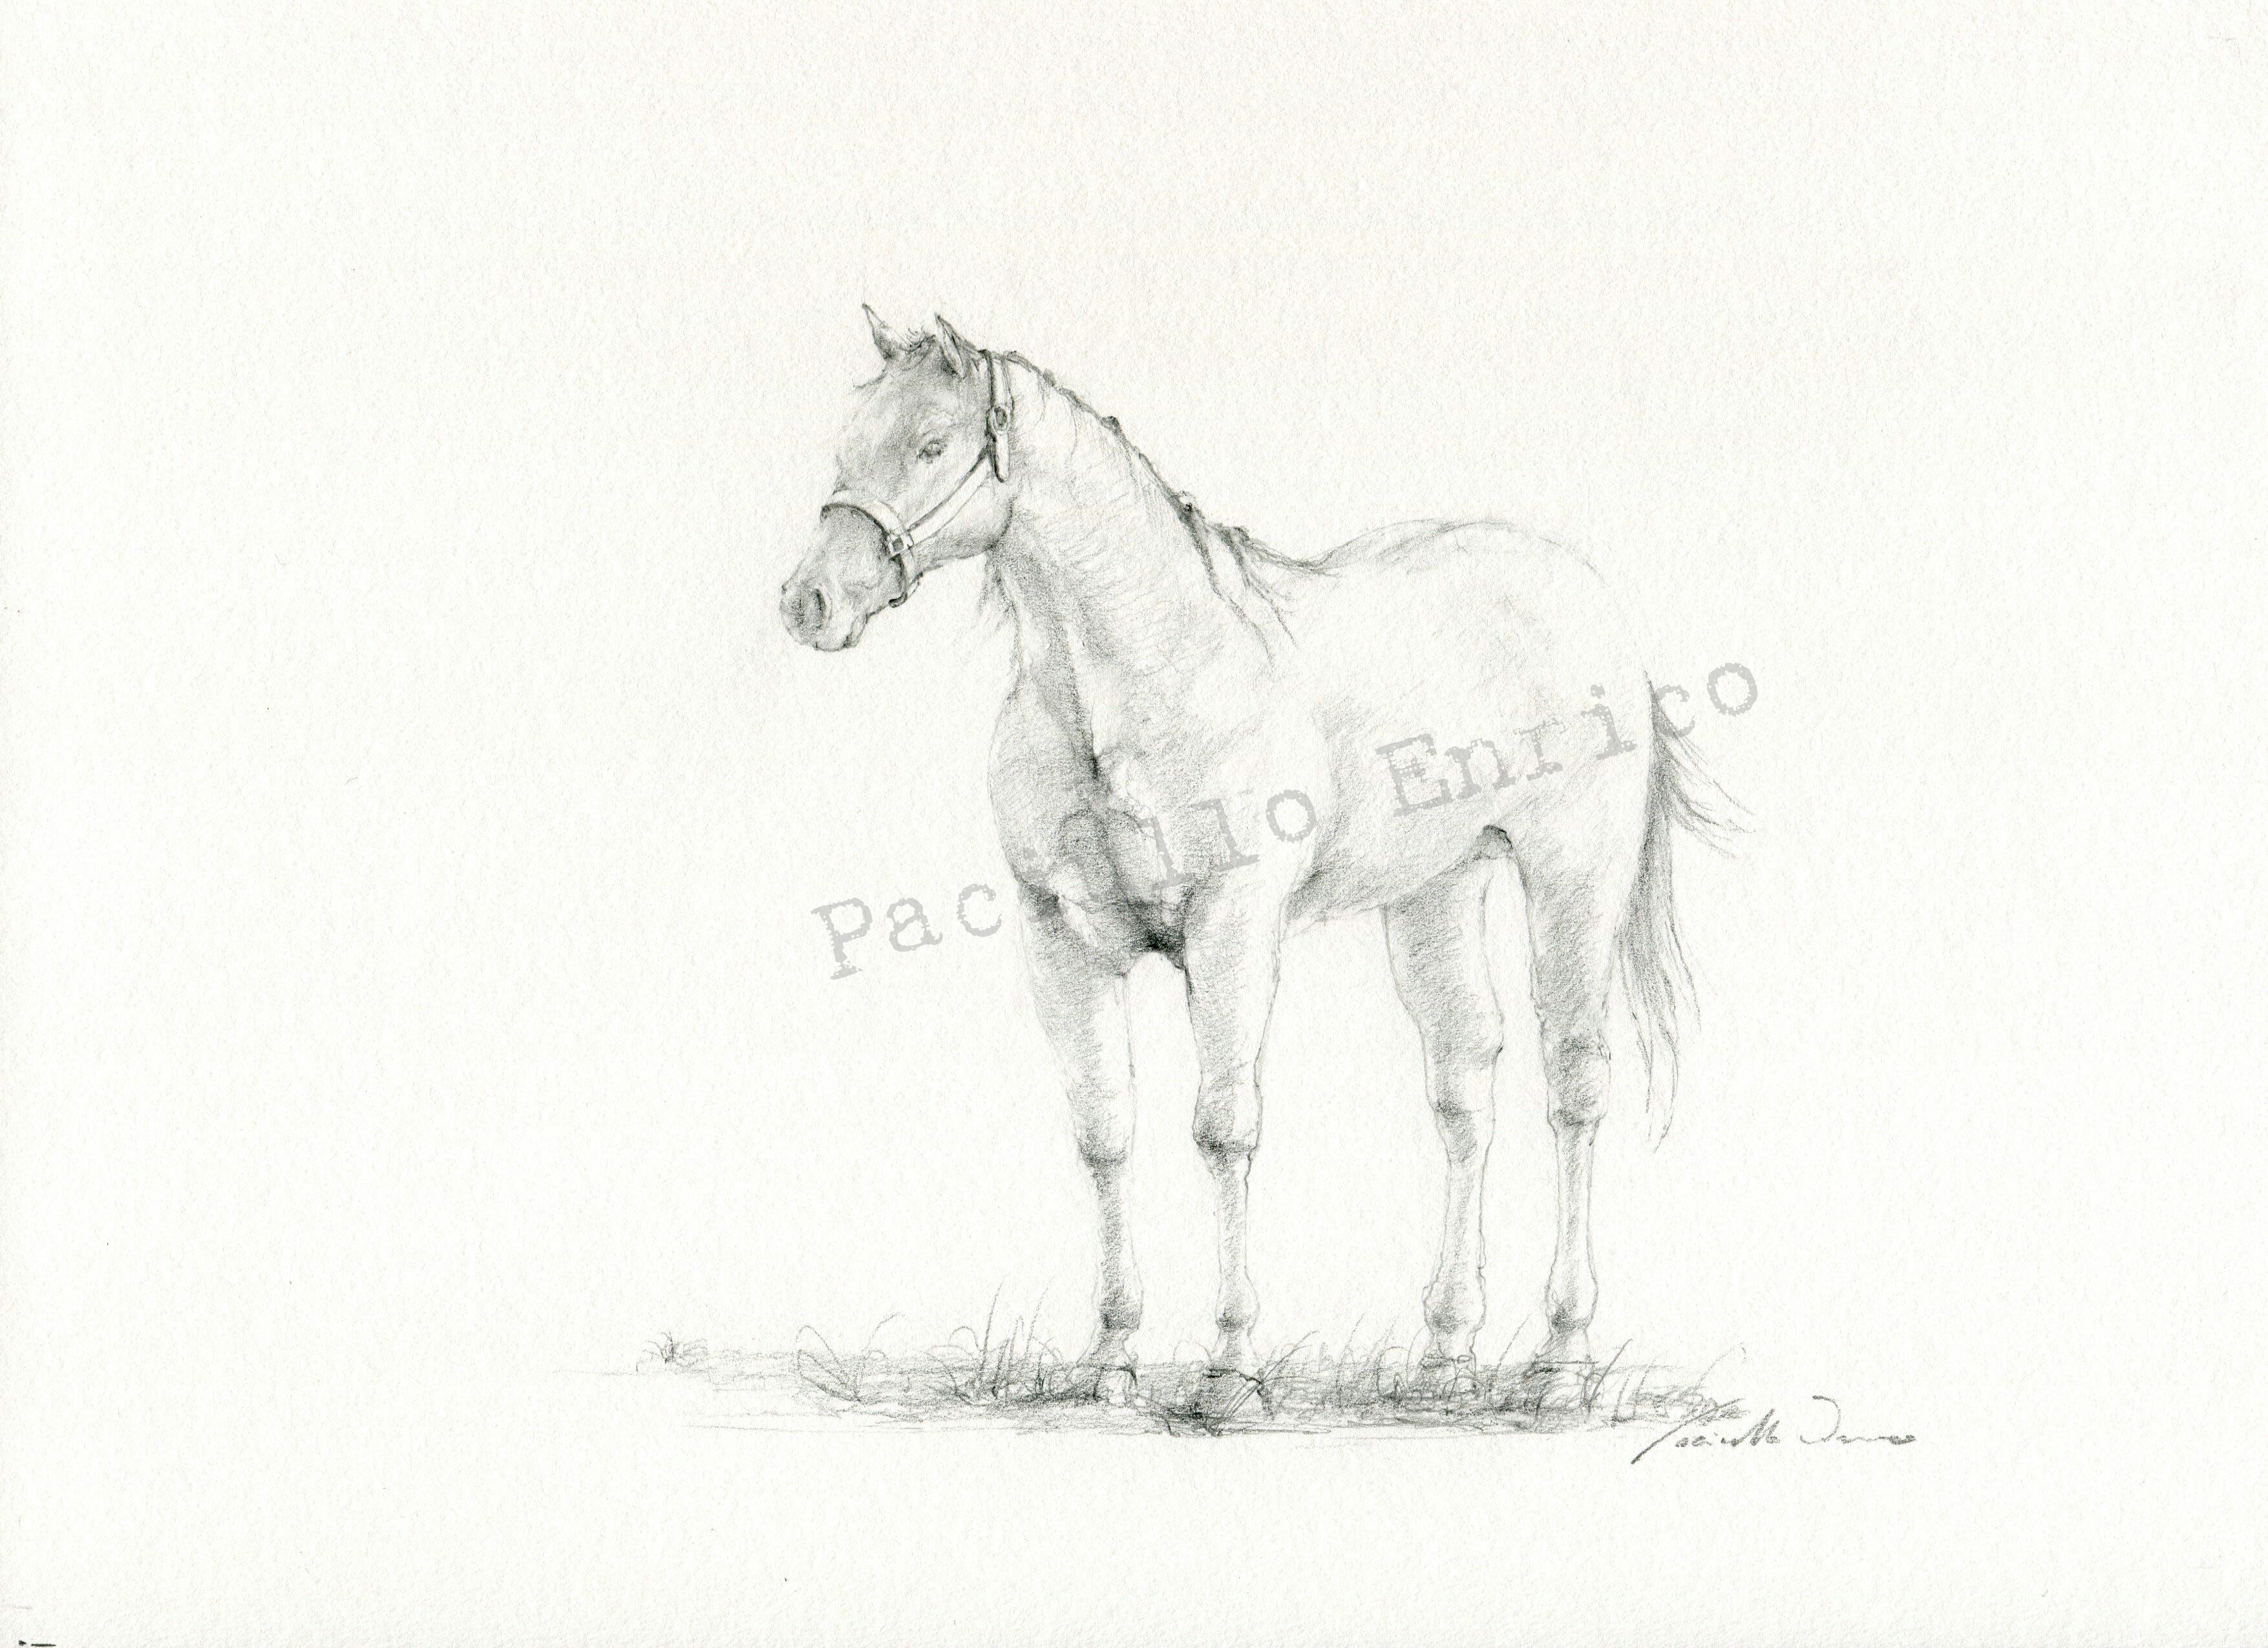 364 caballo a lapiz 20x 29 30 novembre 2